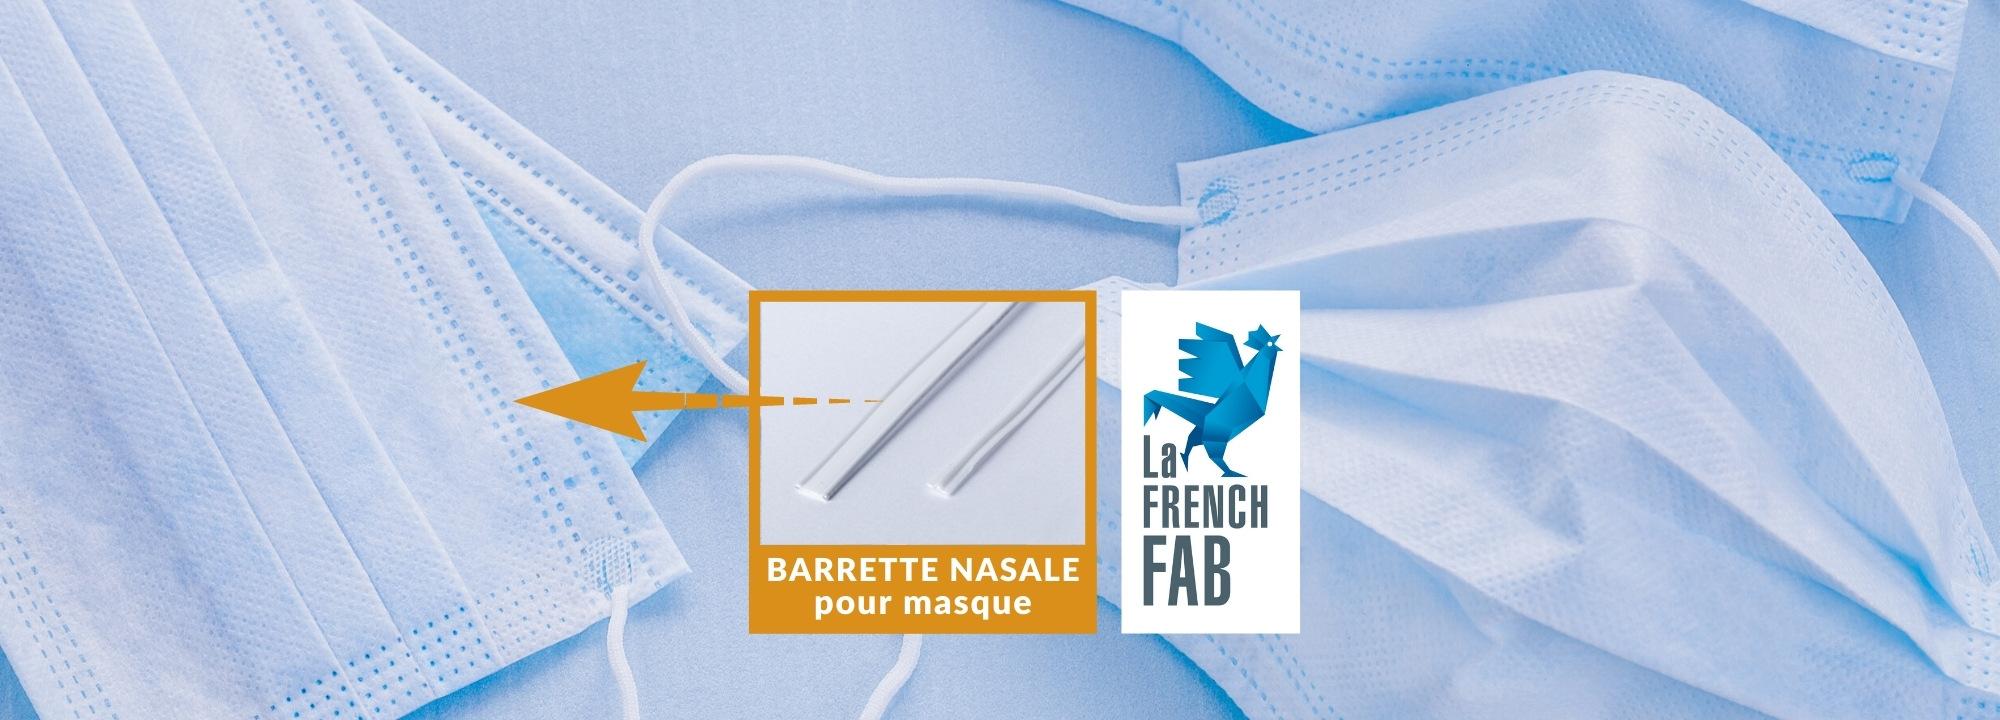 Capifil-Slider-home-Barrette-nasale-pour-masque-V5